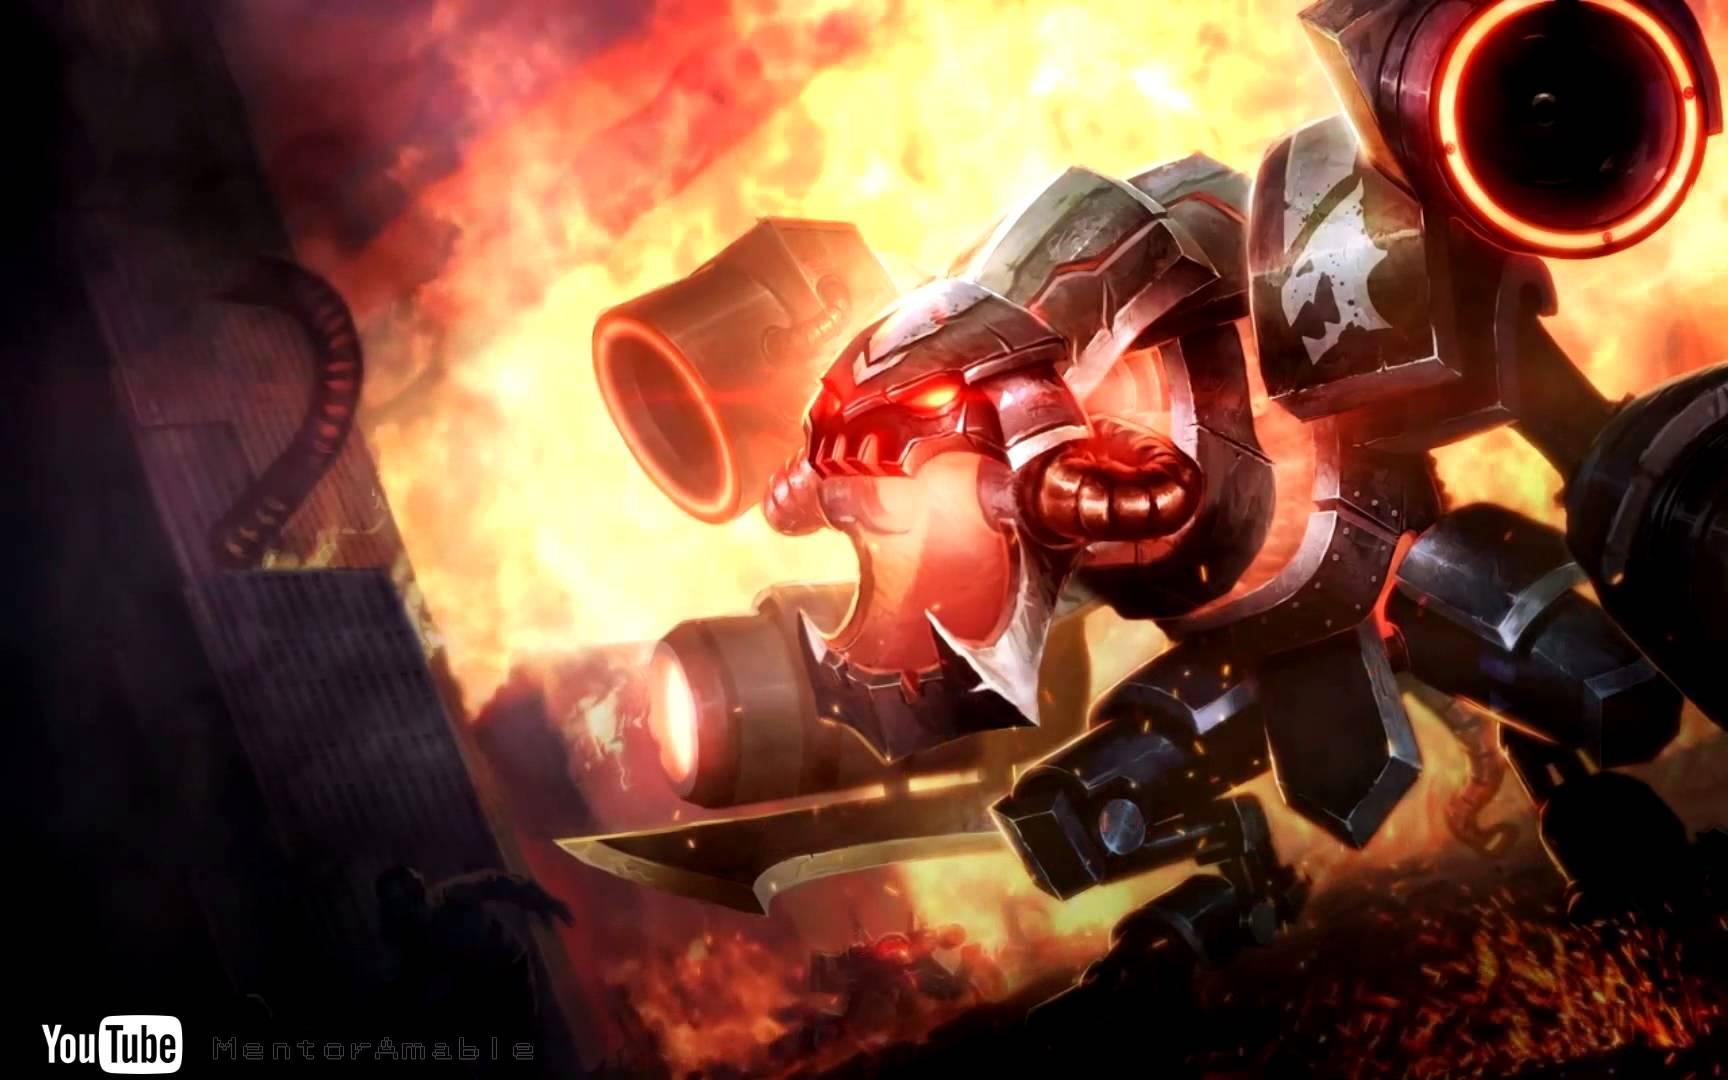 Battlecast Prime ChoGath   Dreamscene HD wallpaper animated 1728x1080